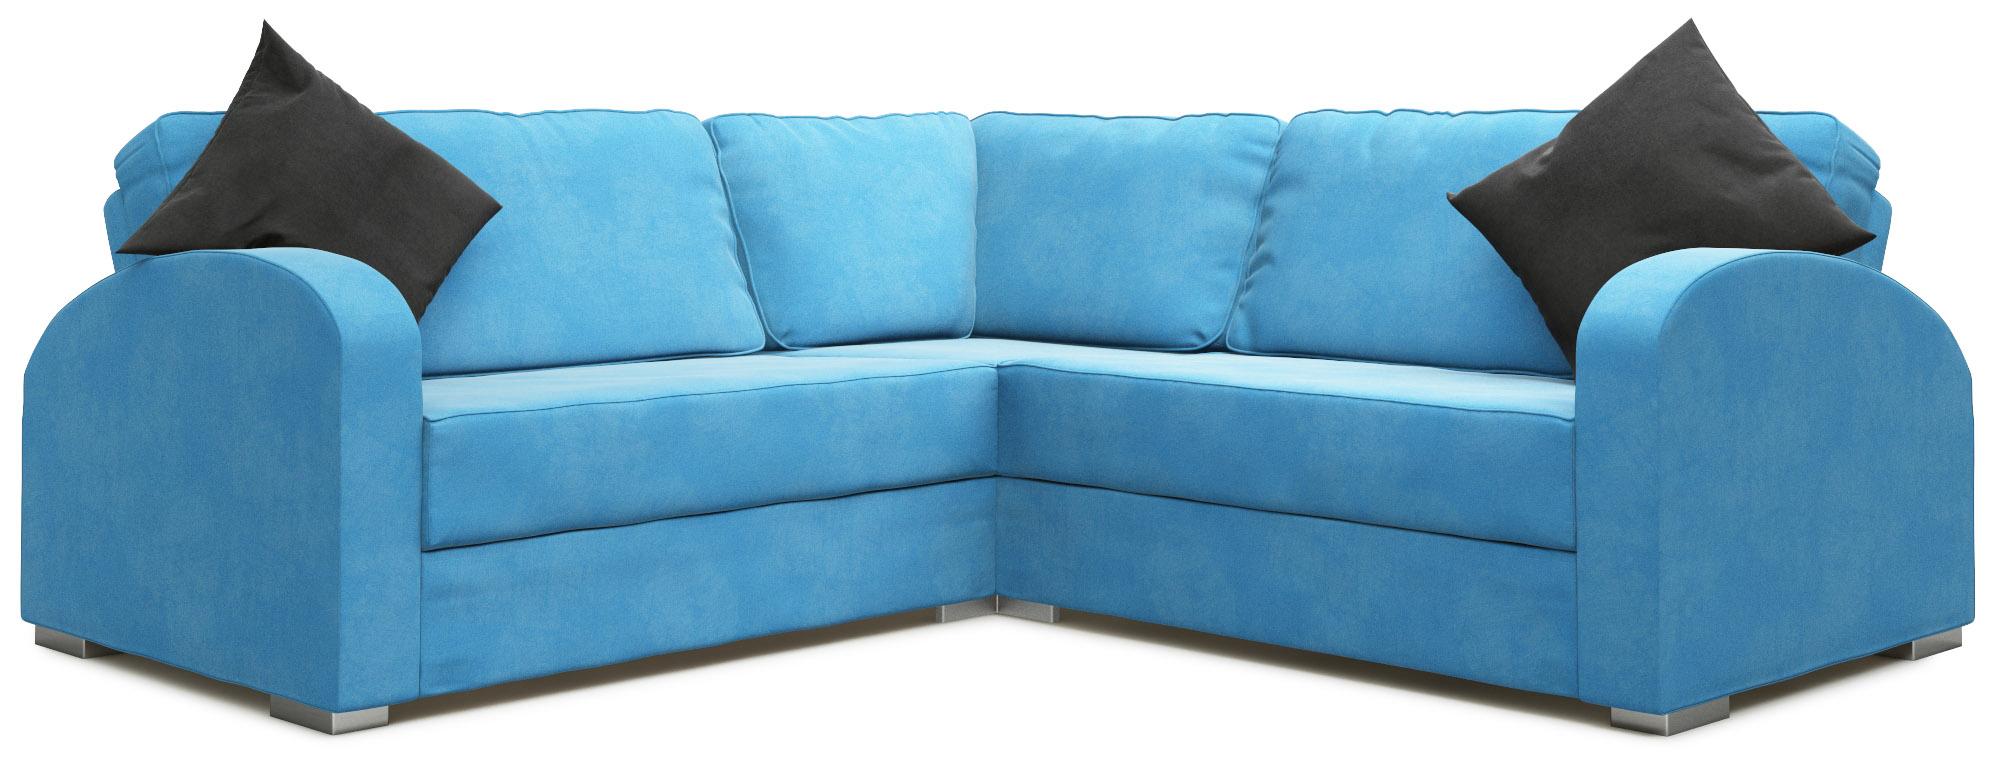 Xuxu 2X2 Corner Sofa